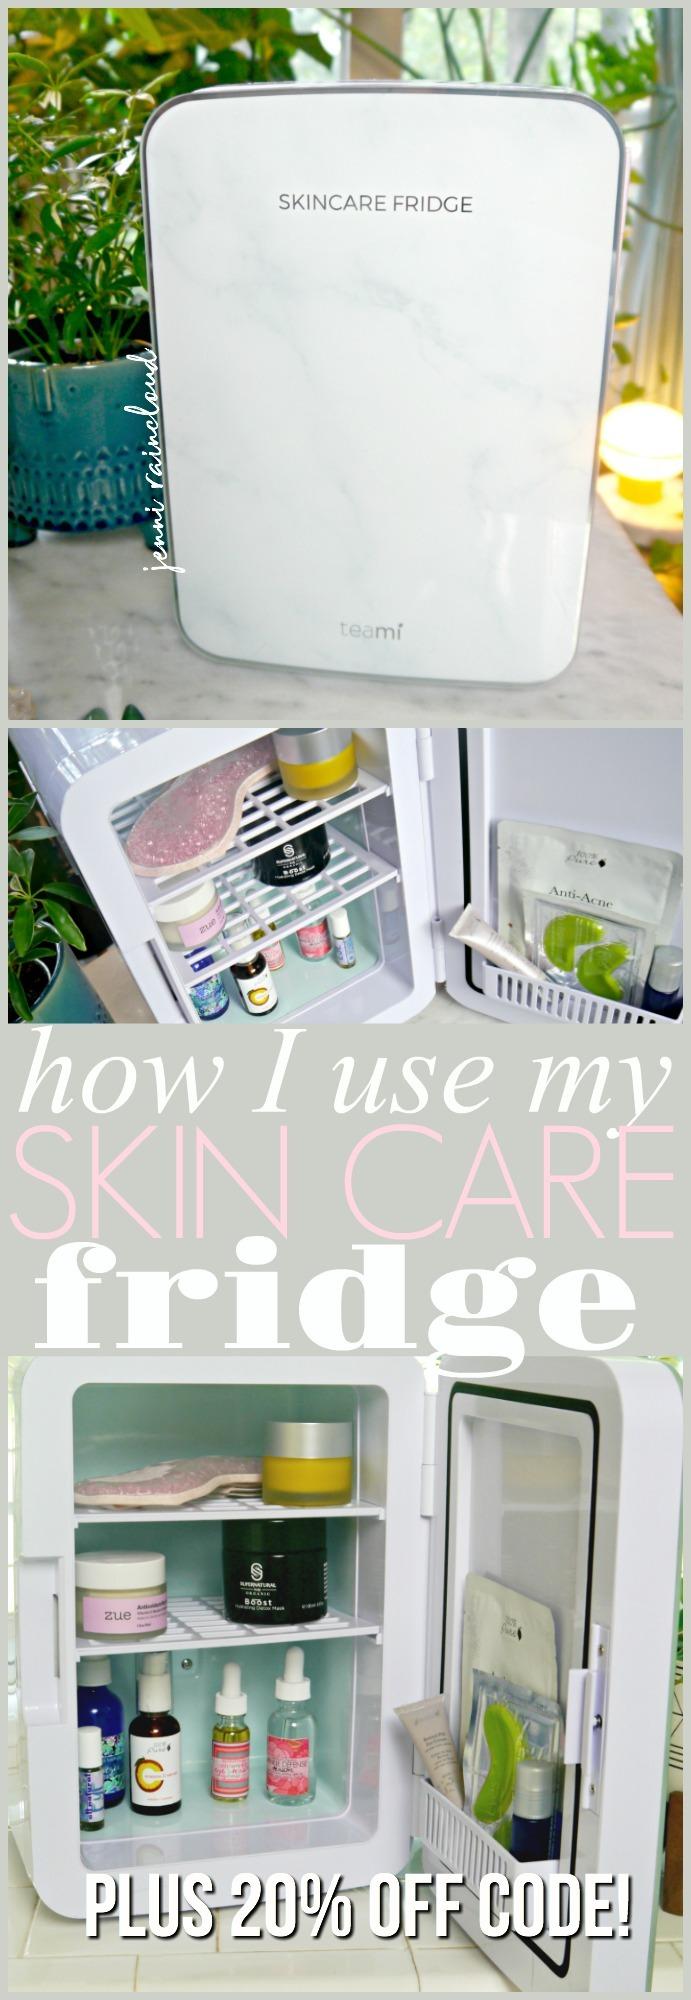 Skin Care Fridge Teami Blends